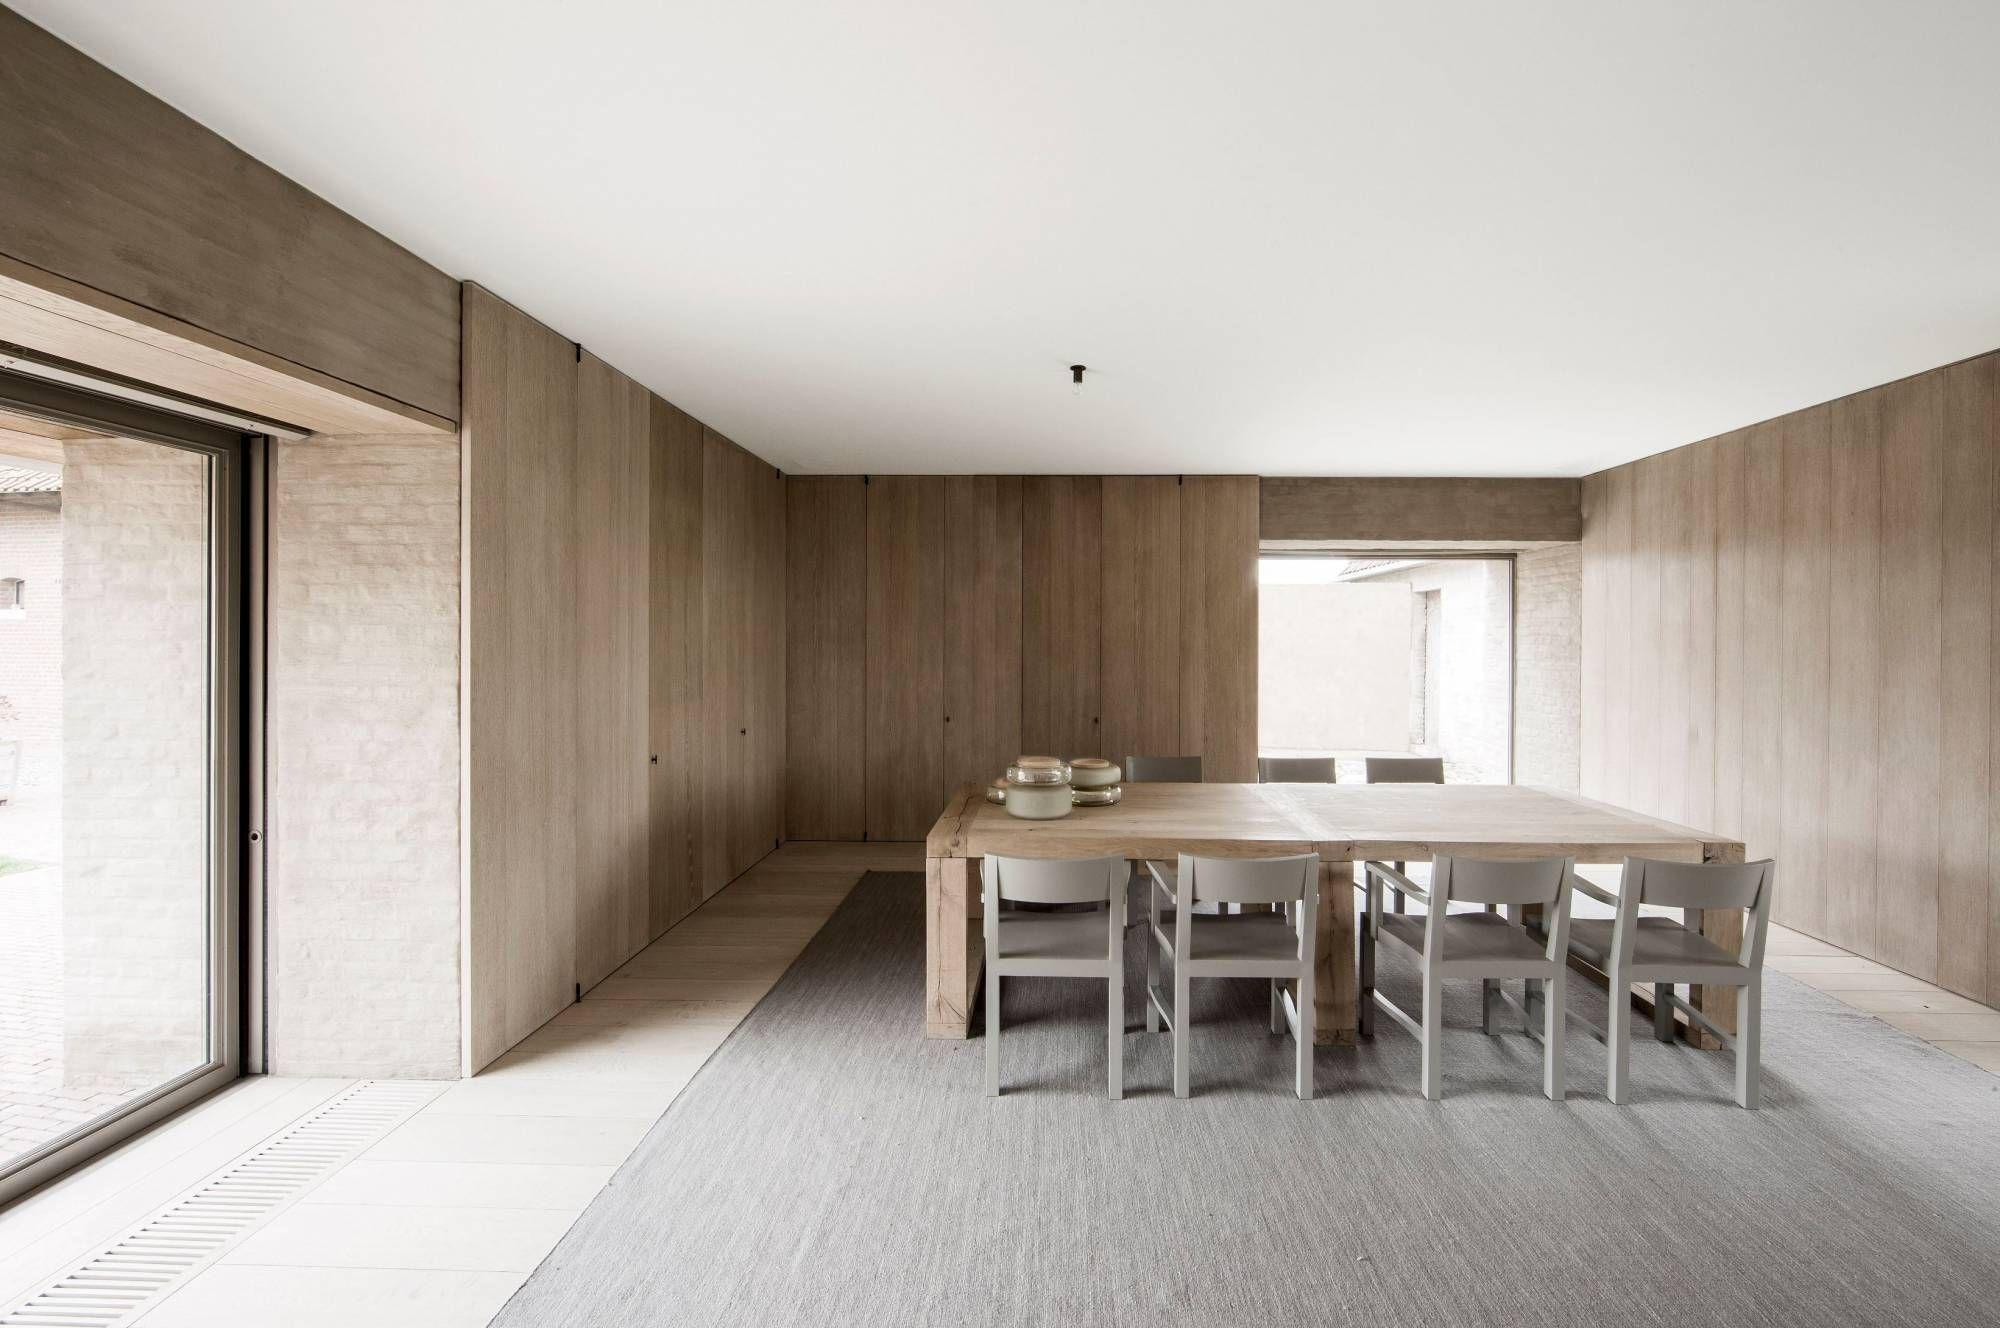 BS Residence, Zwevegem, Belgium, by Vincent Van Duysen | Interieur ...